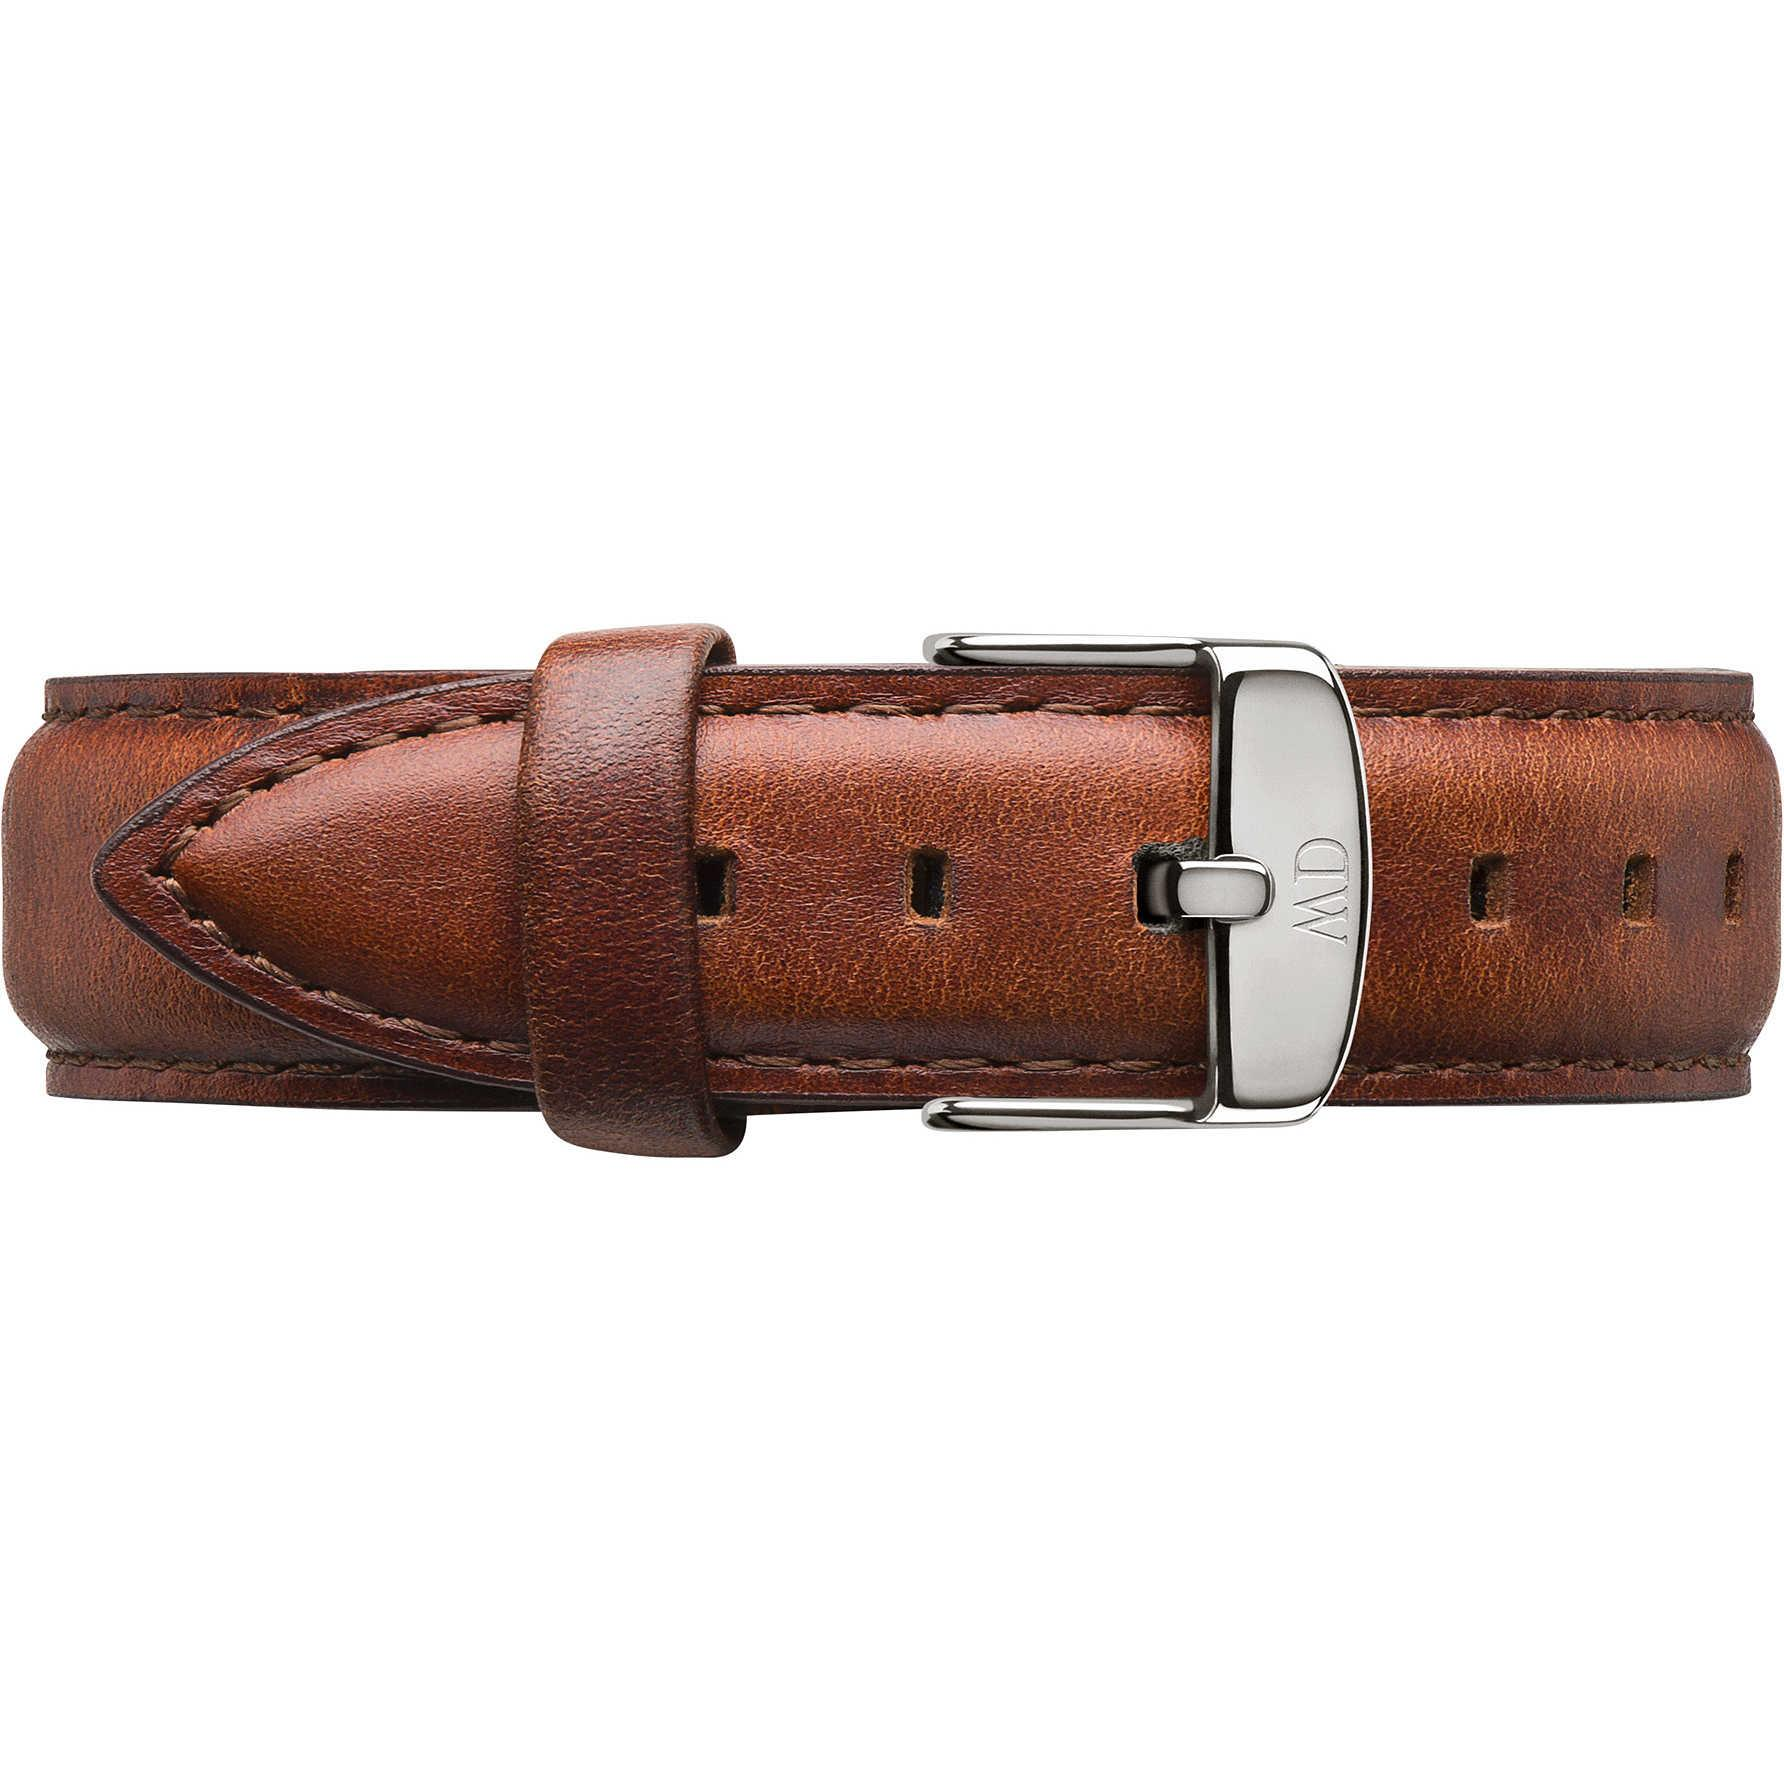 Cinturino Classic Petite St Mawes Pelle Marrone Donna Argento 14mm DW00200151 - DANIEL WELLINGTON